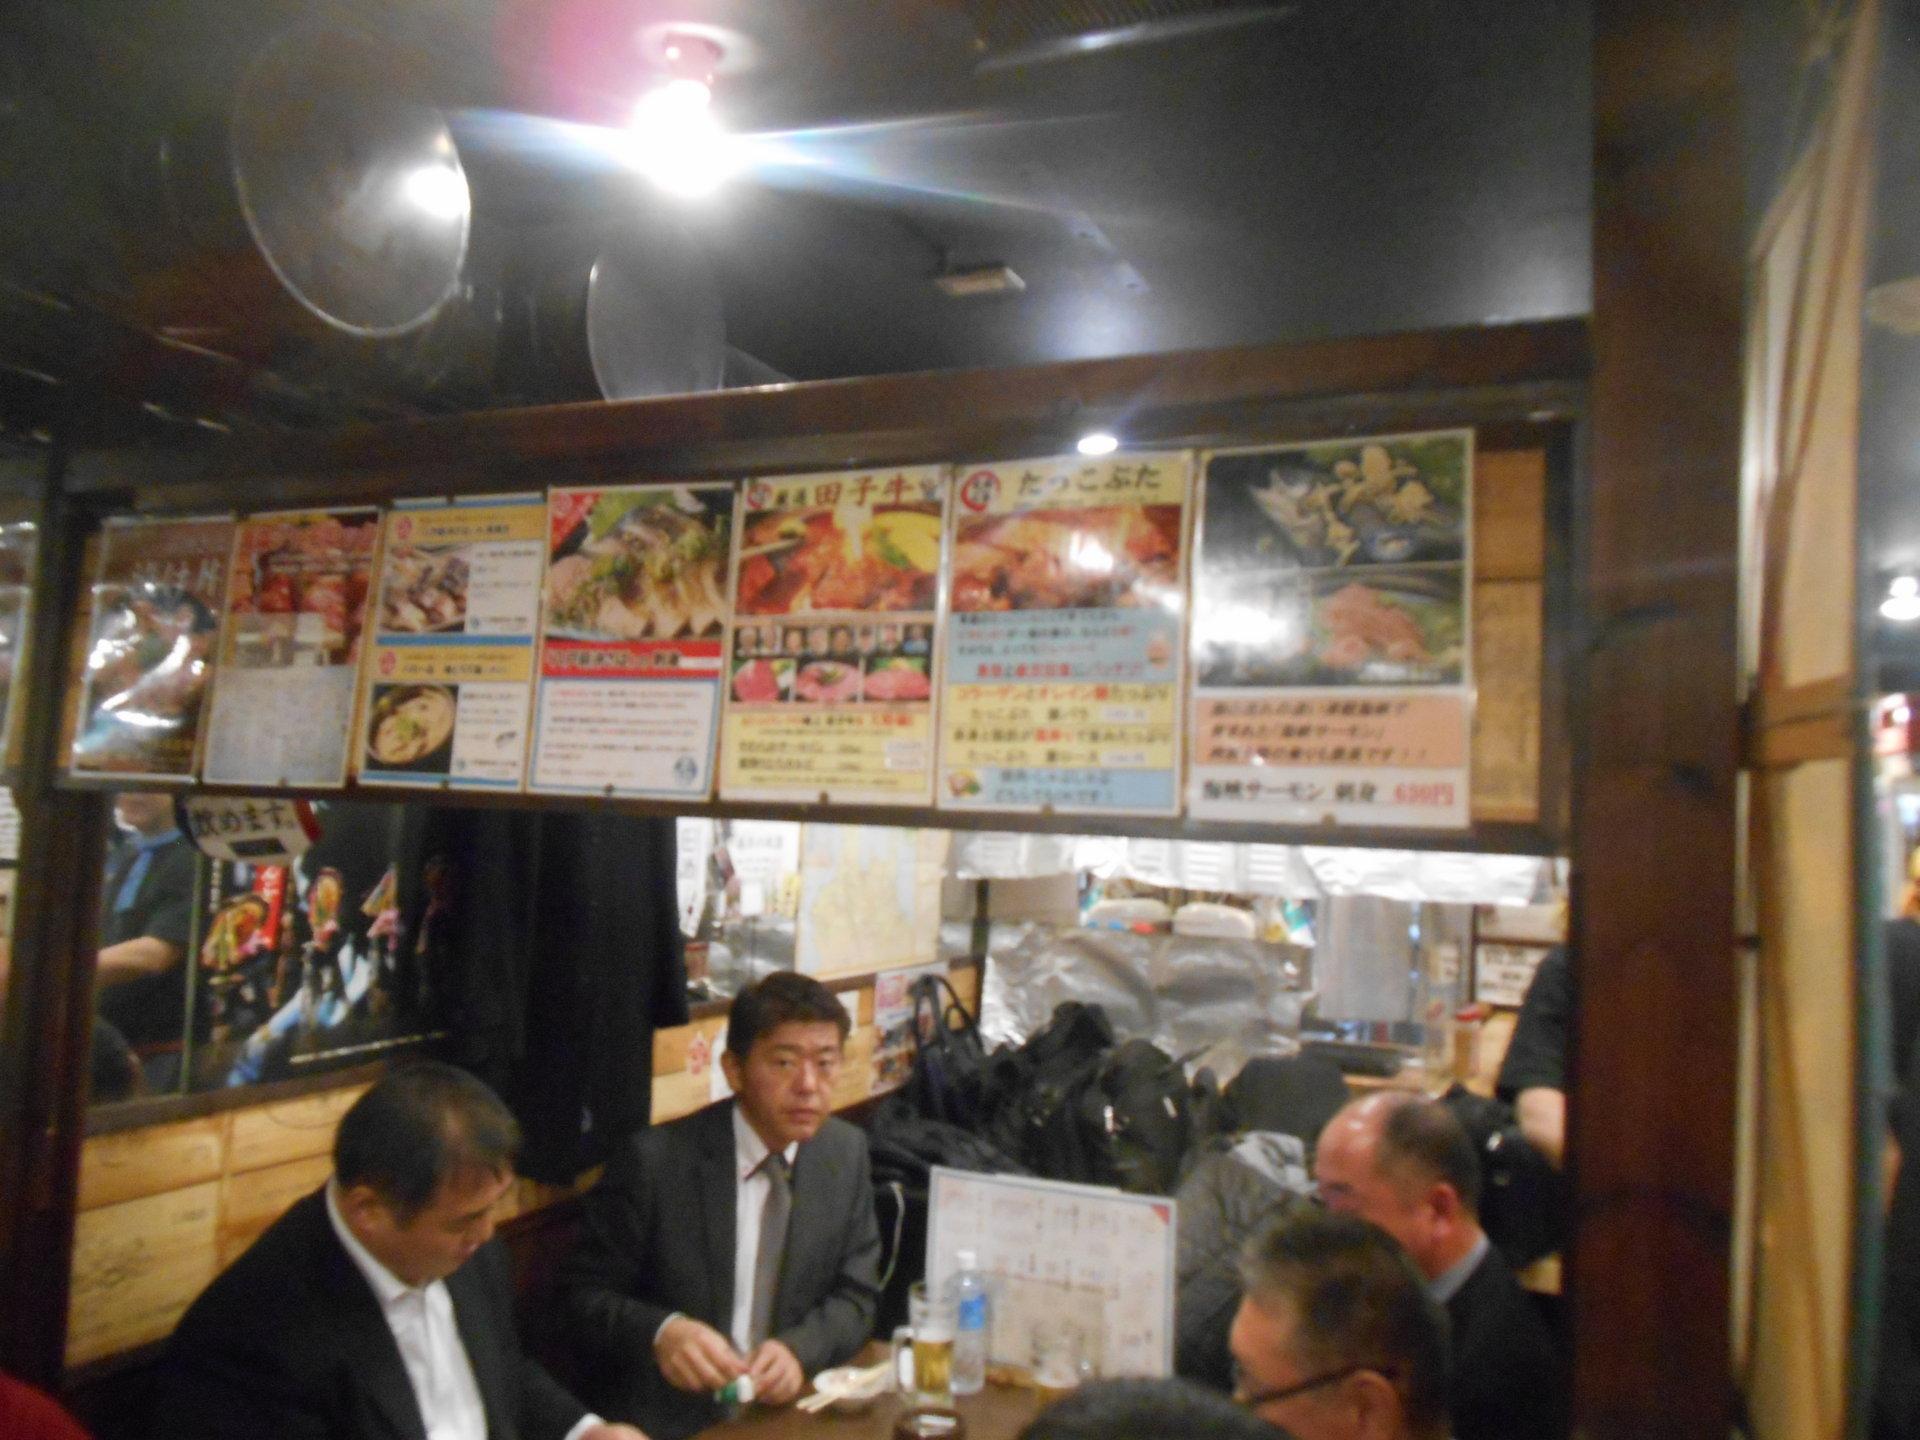 DSCN0597 1920x1440 - 2015年12月21日(月) AOsuki忘年会開催しました。